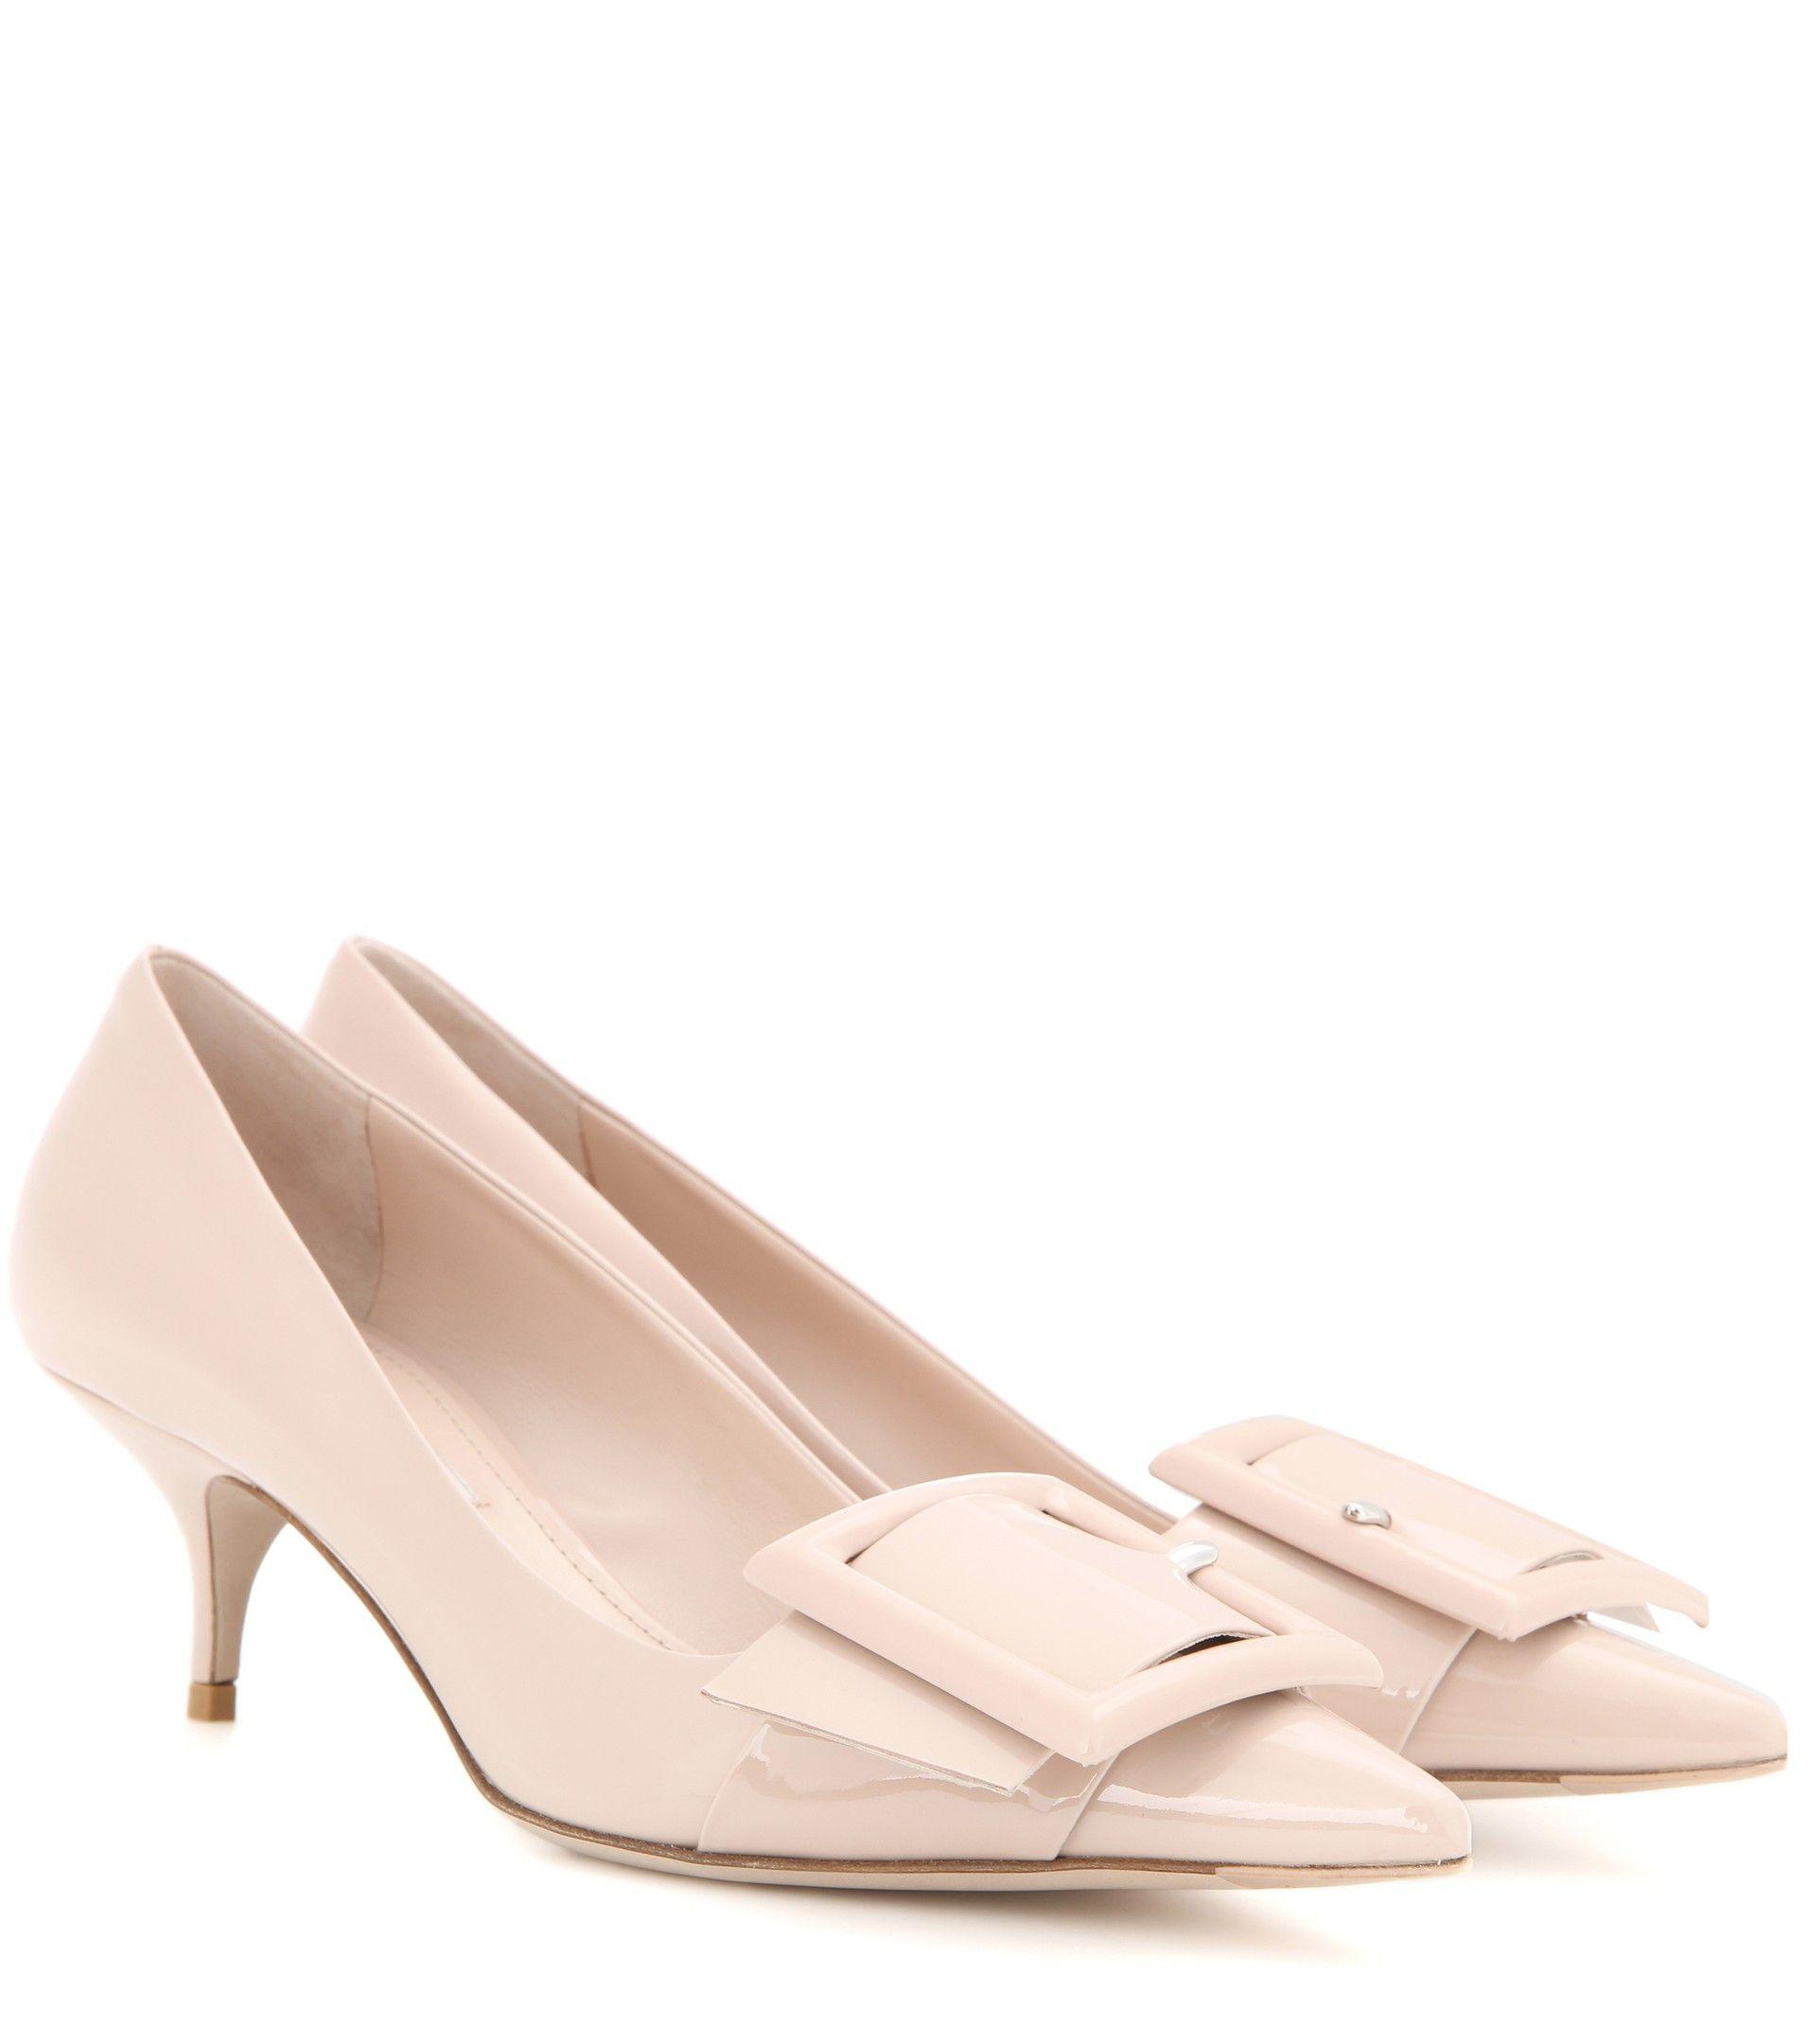 241e356df0fa1d Miu Miu Nude patent leather kitten-heel pumps